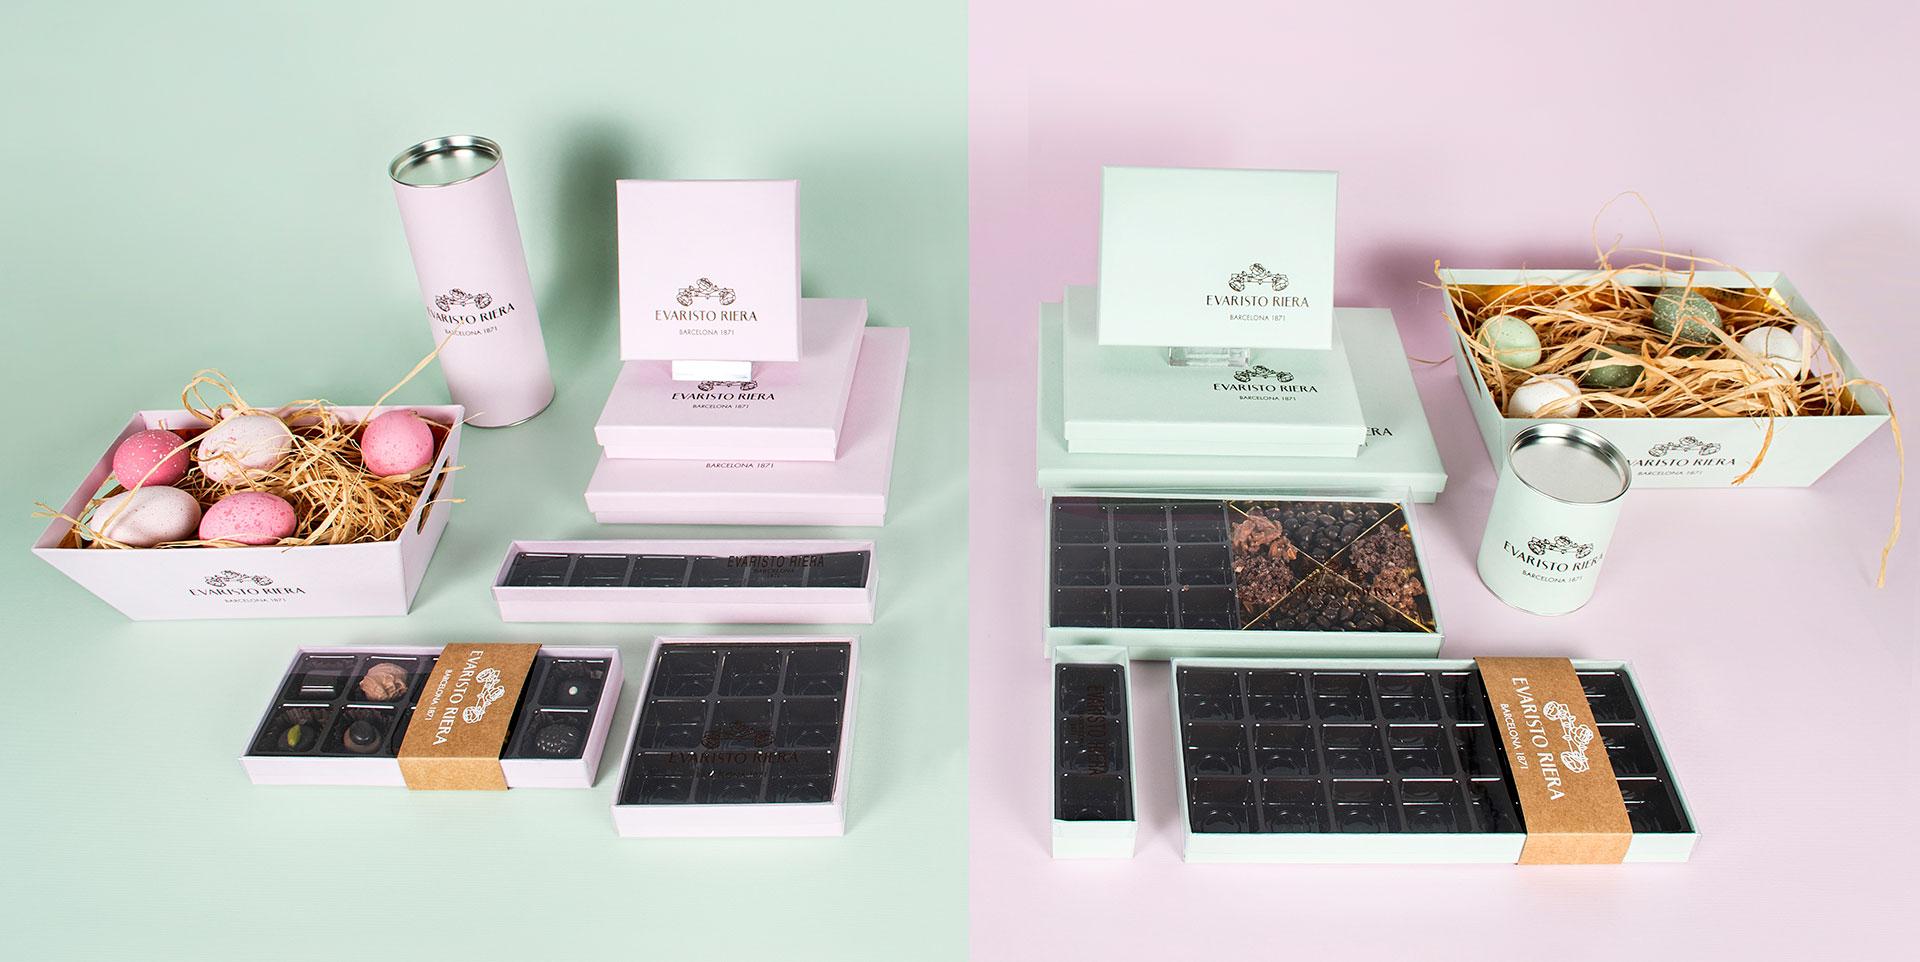 1-fabricante-cajas-carton-huevos-de-pascua-pasqua-chocolates-mona-semana-santa.jpg